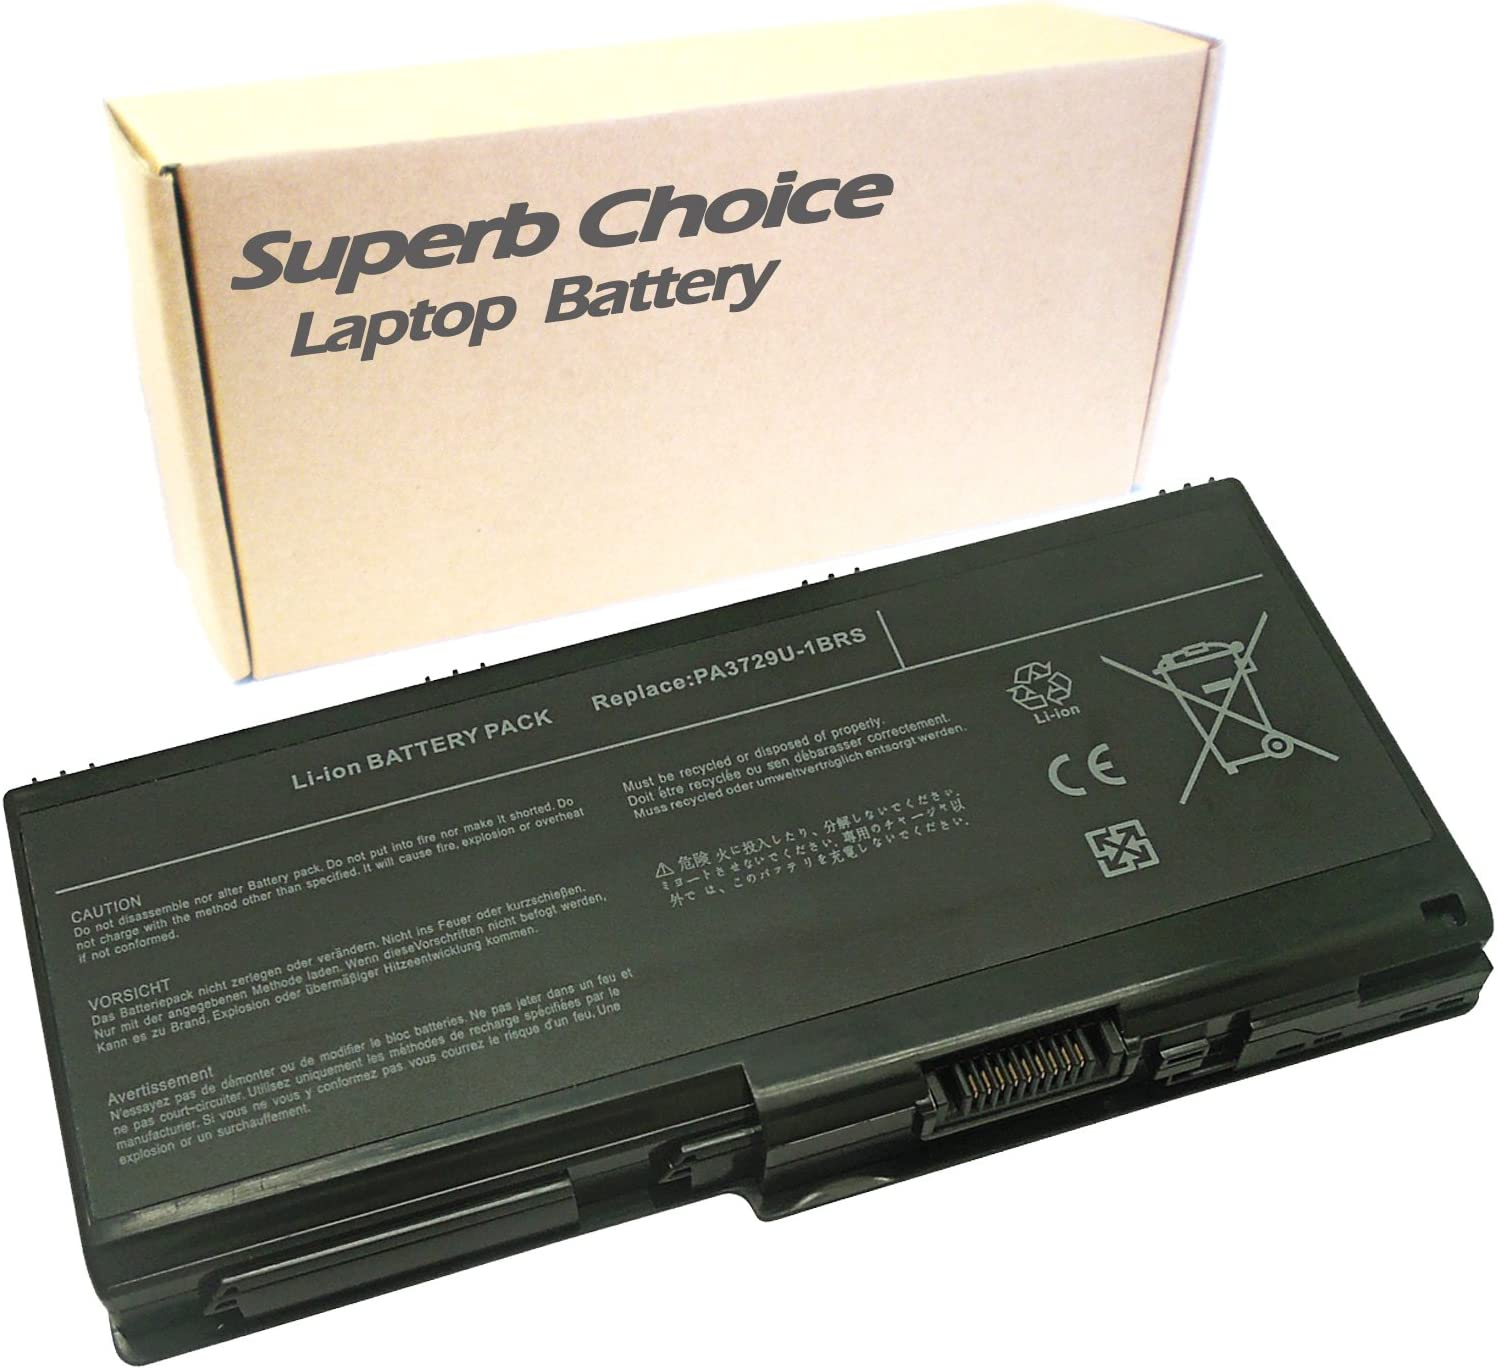 Superb Choice 9-Cell Battery Compatible with Toshiba Qosmio X505-Q894, 10.8V,6600mAh